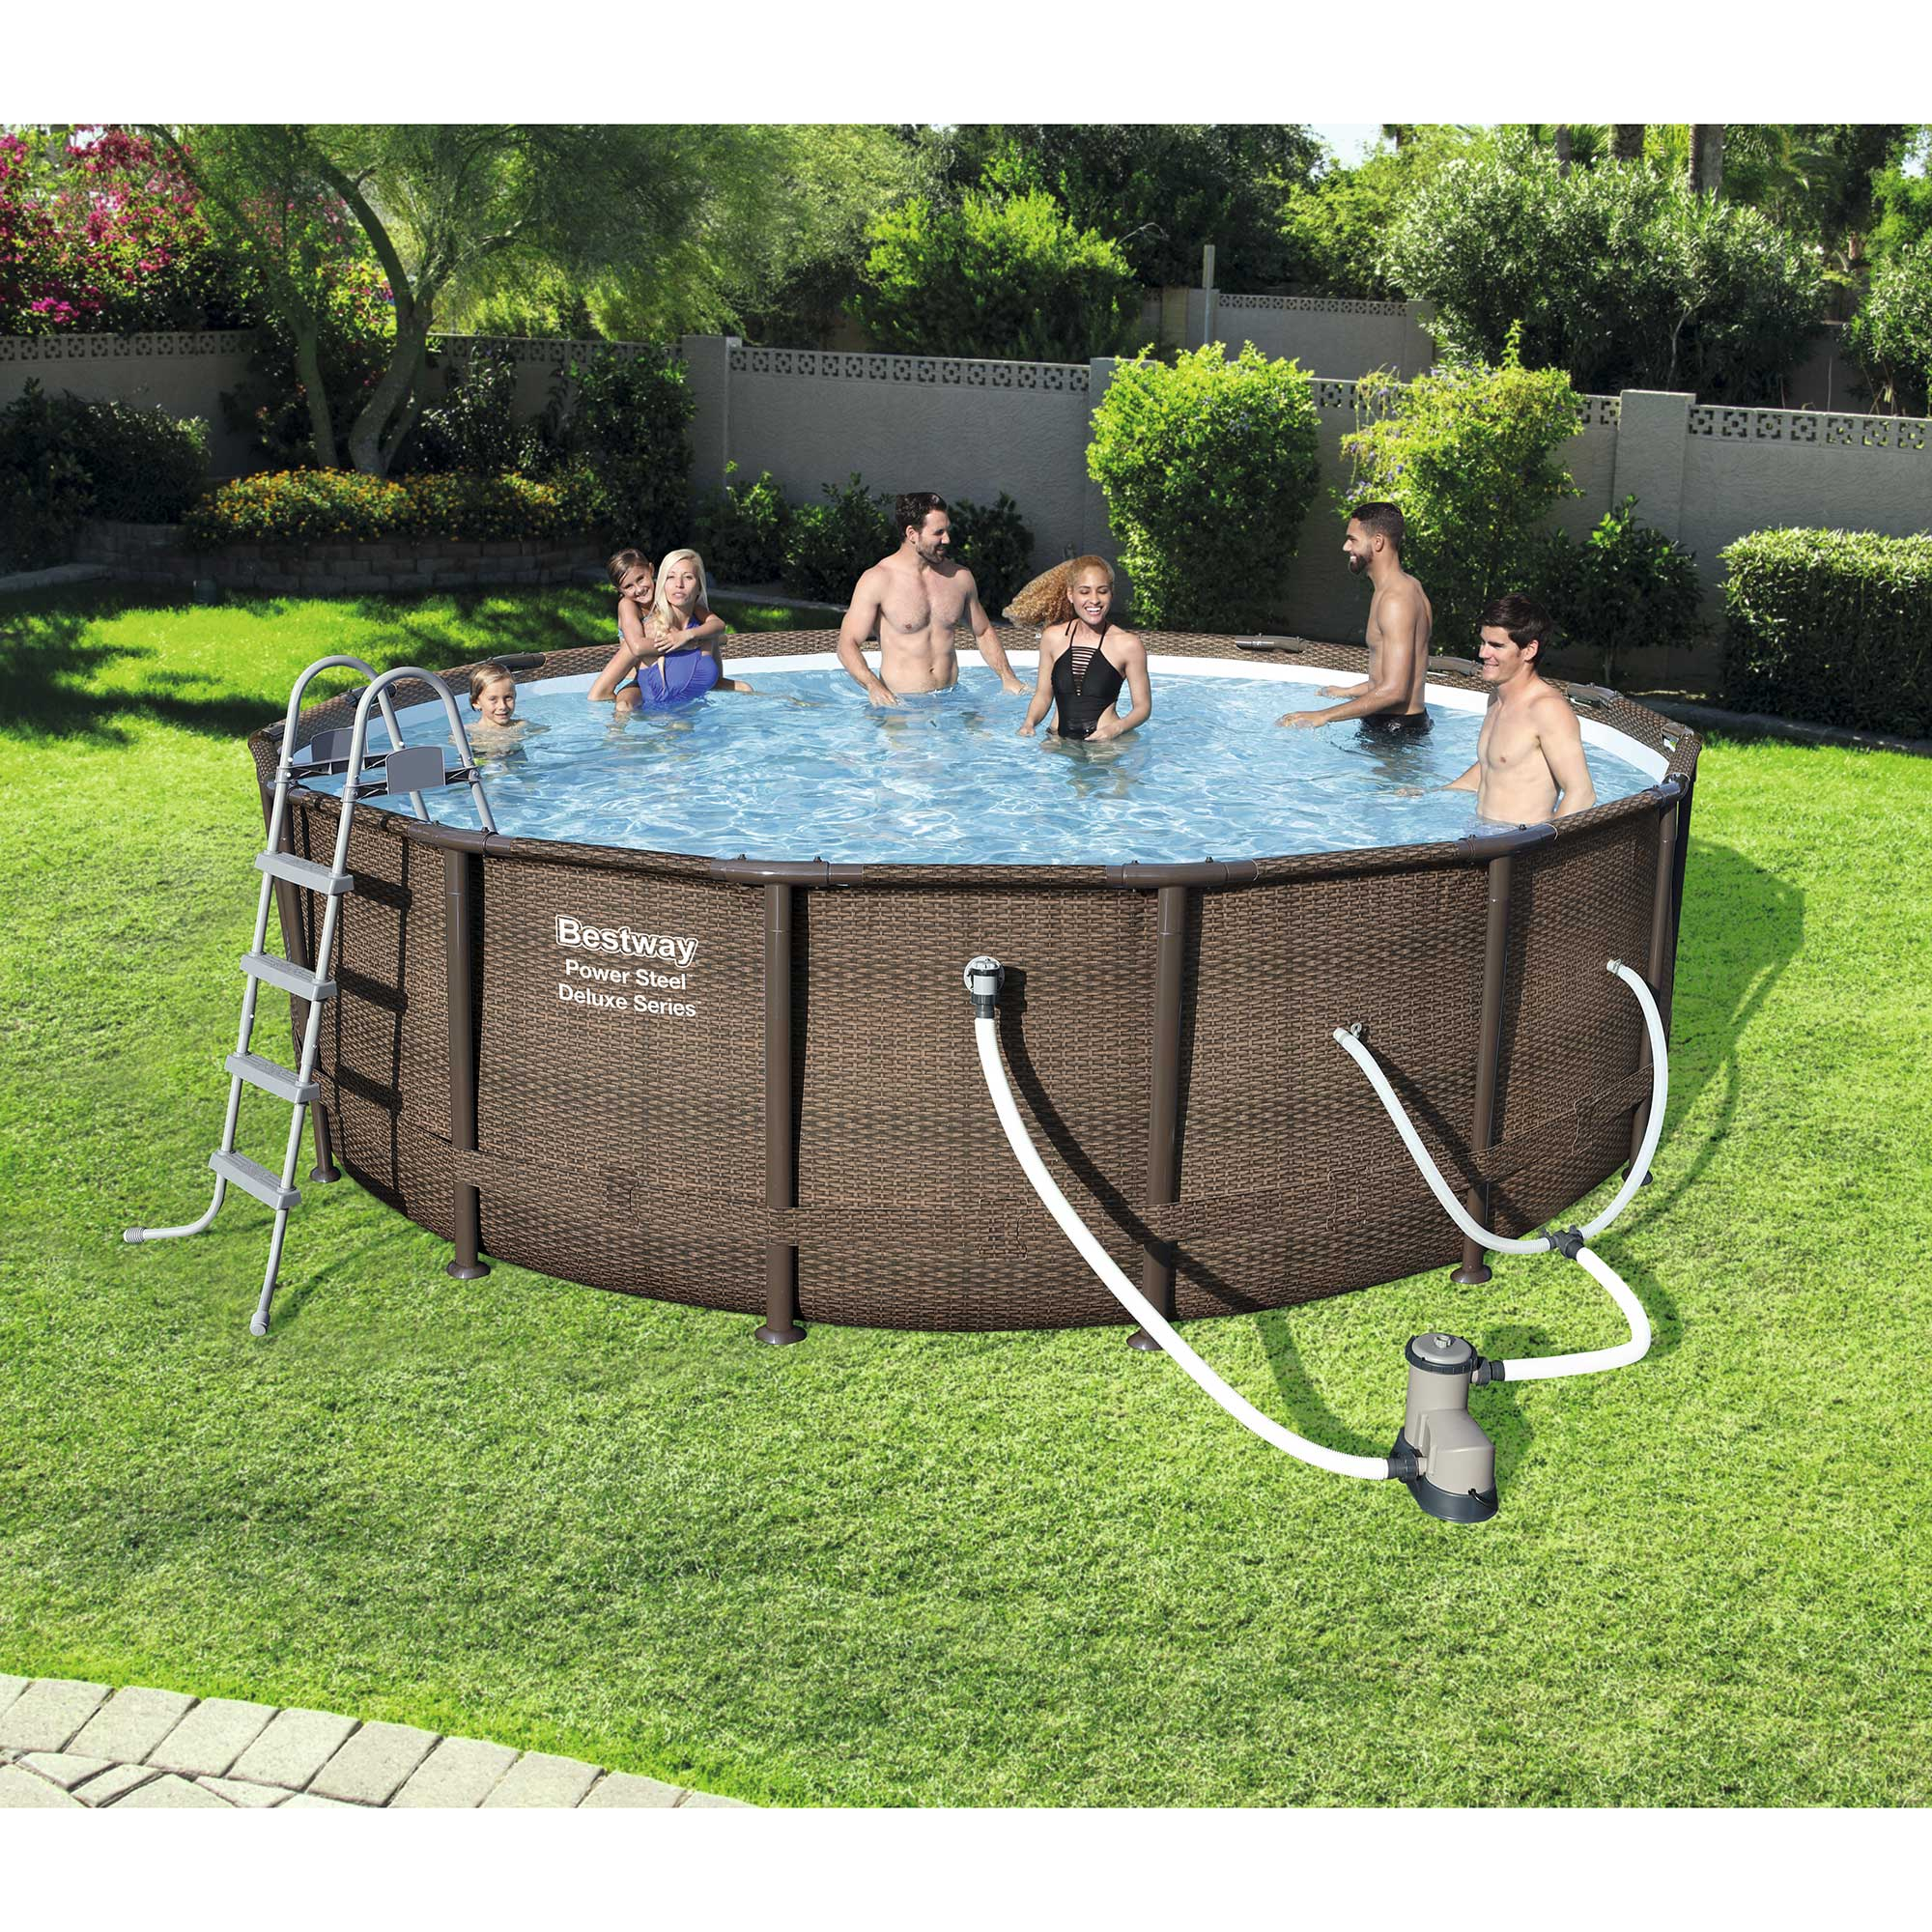 "Bestway 16' x 48"" Power Steel Frame Above Ground Swimming Pool Set with Pump by Bestway"